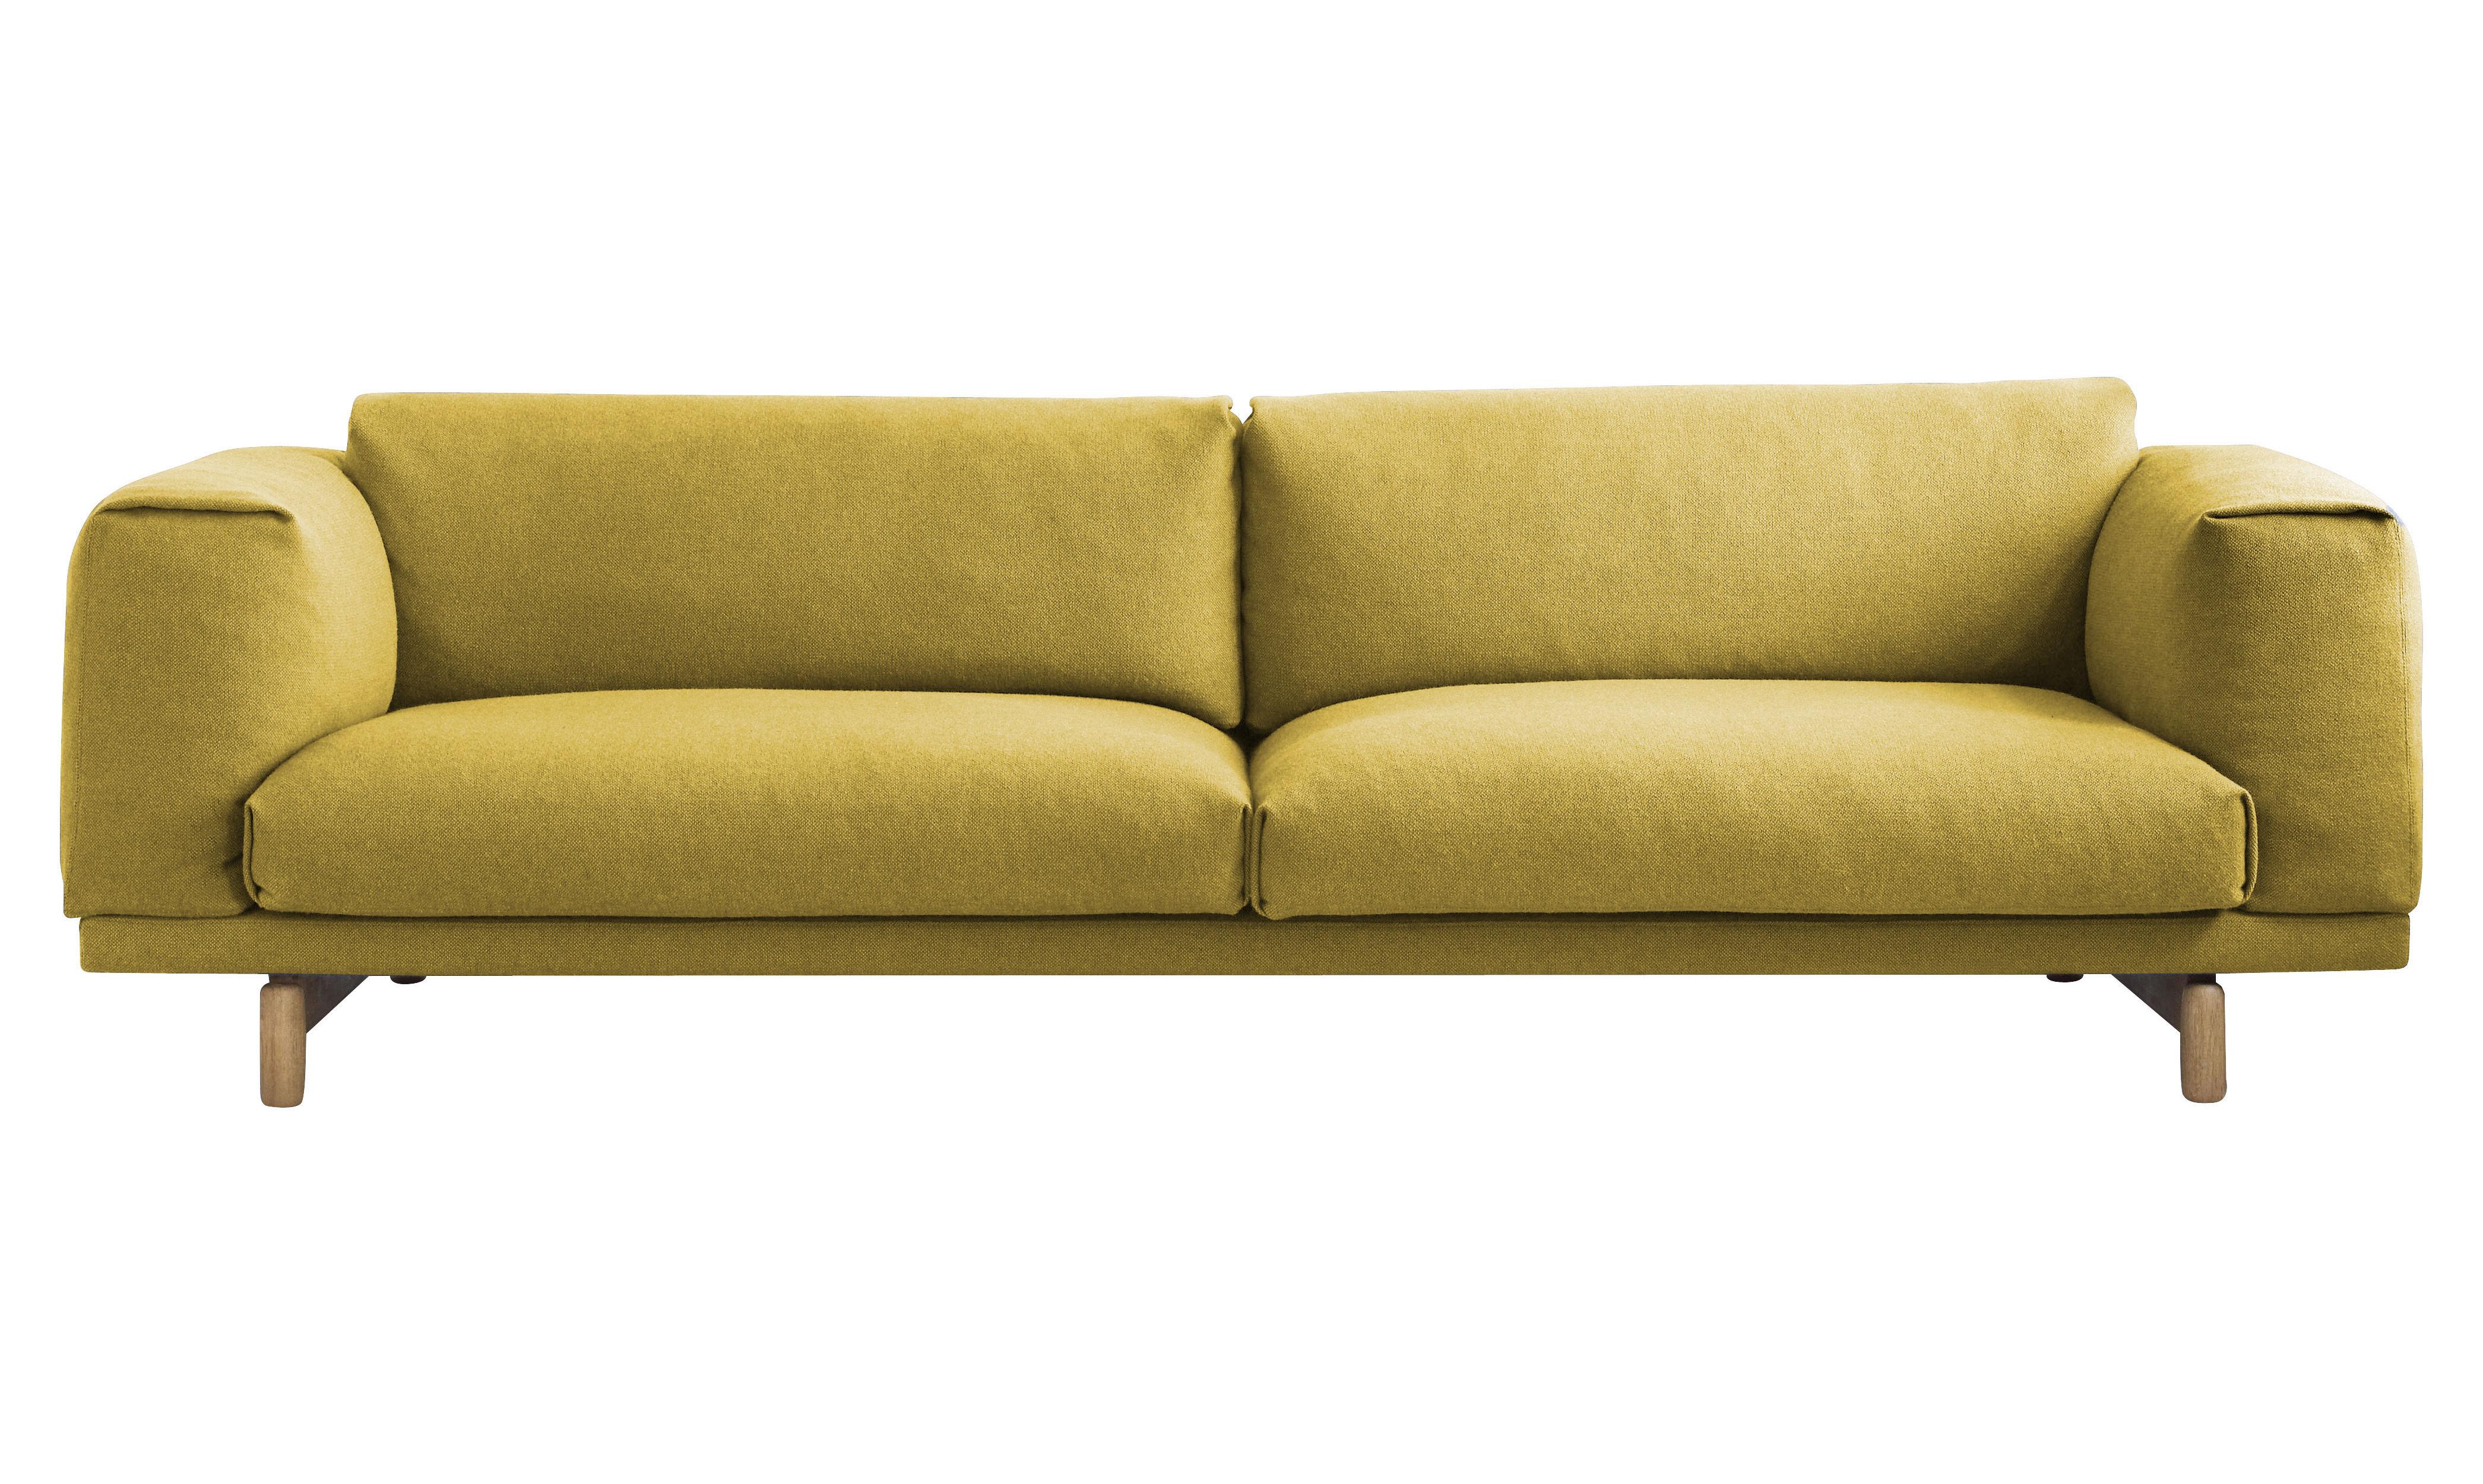 Muuto Rest Sofa : Rest 3 sitzer muuto sofa